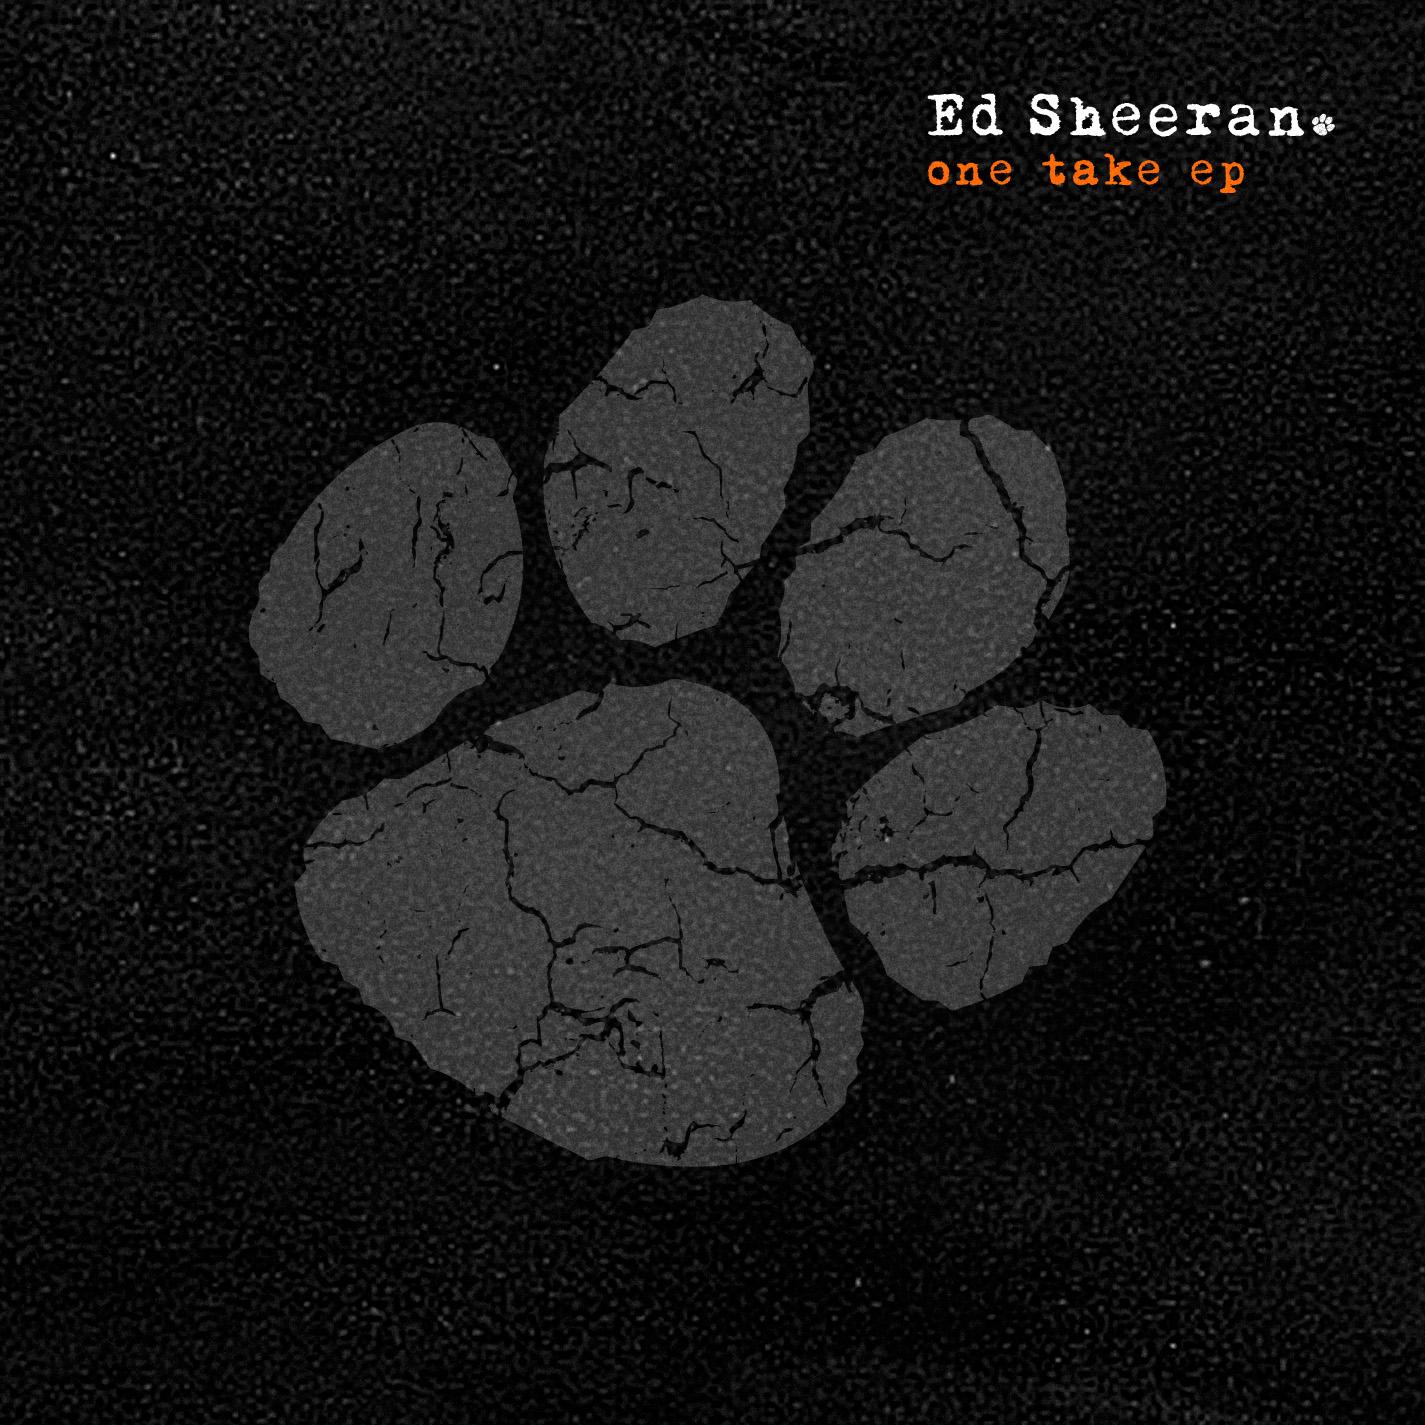 One take ed sheeran wiki fandom powered by wikia - Ed sheeran give me love live room ...